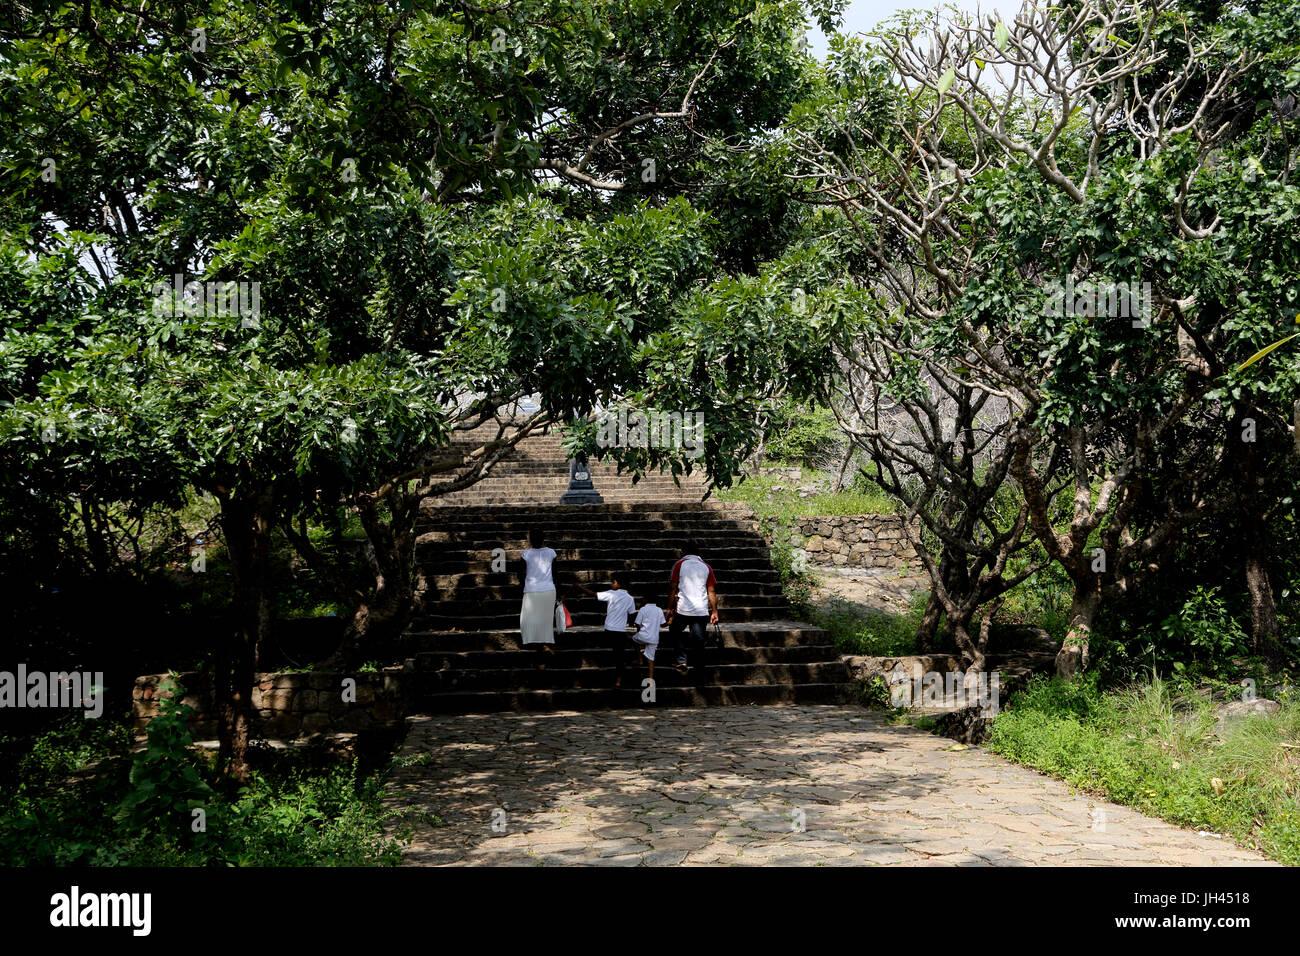 Dambulla Sri Lanka Sri Lankan Family Climbing Steps Towards Dambulla Cave Temples - Stock Image